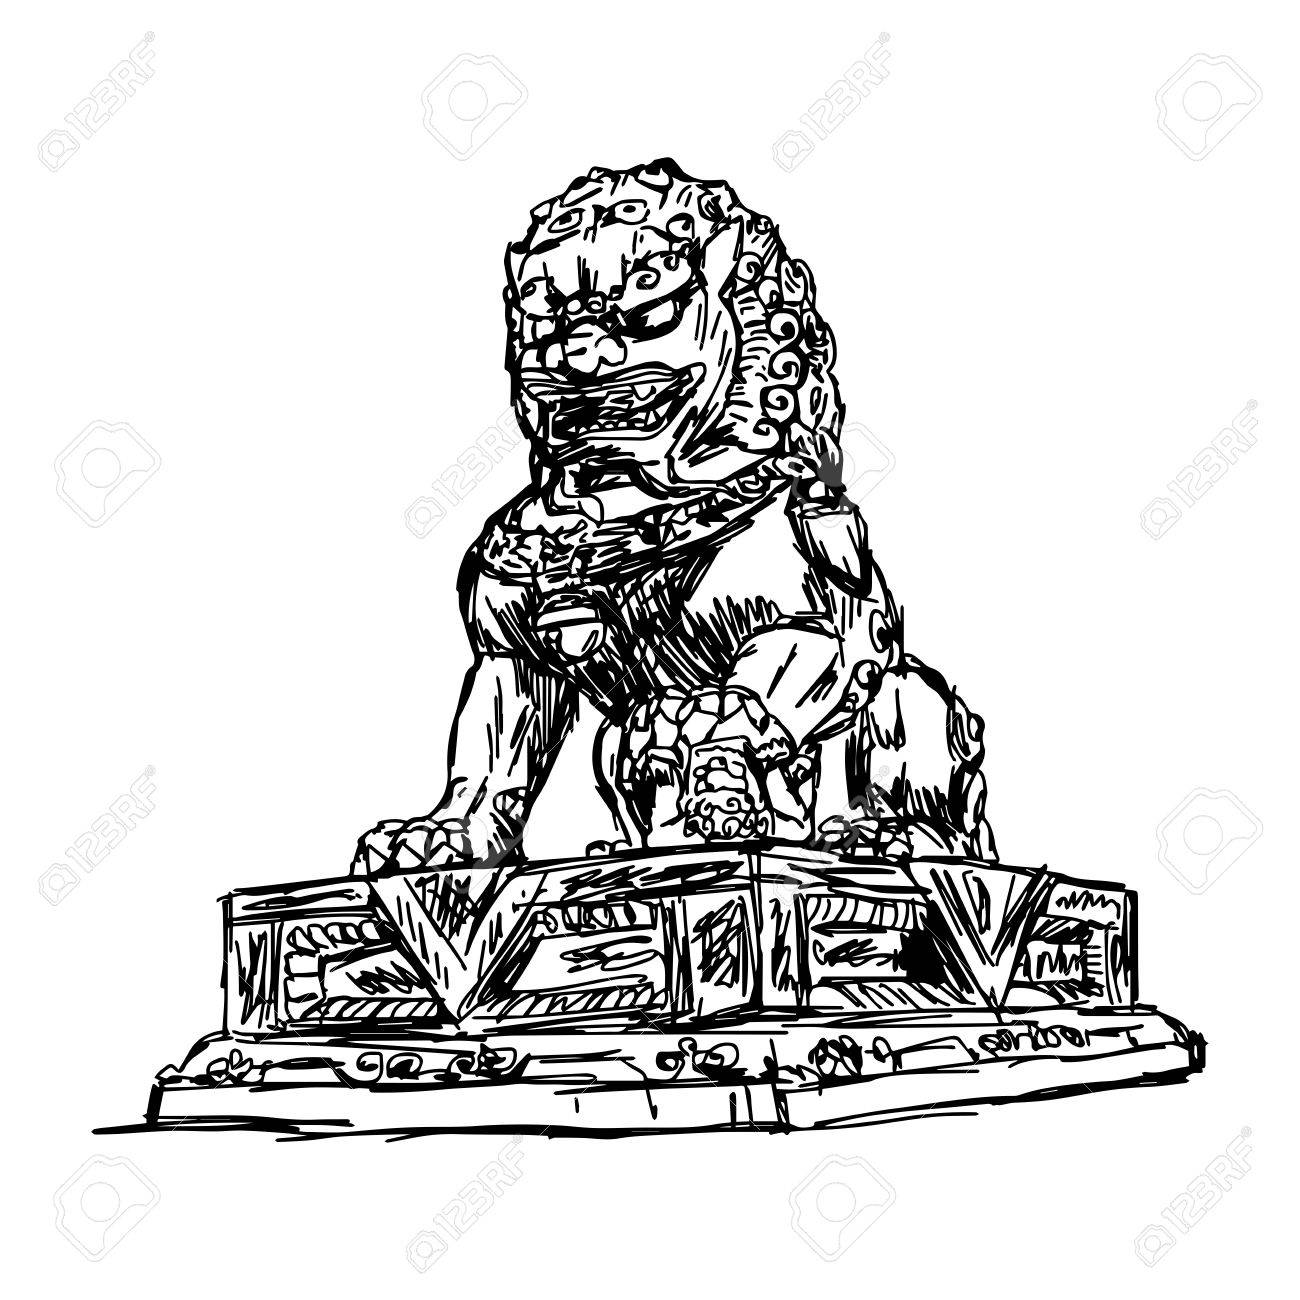 1300x1300 Illustration Vector Doodle Hand Drawn Of Sketch Big Bronze Lion